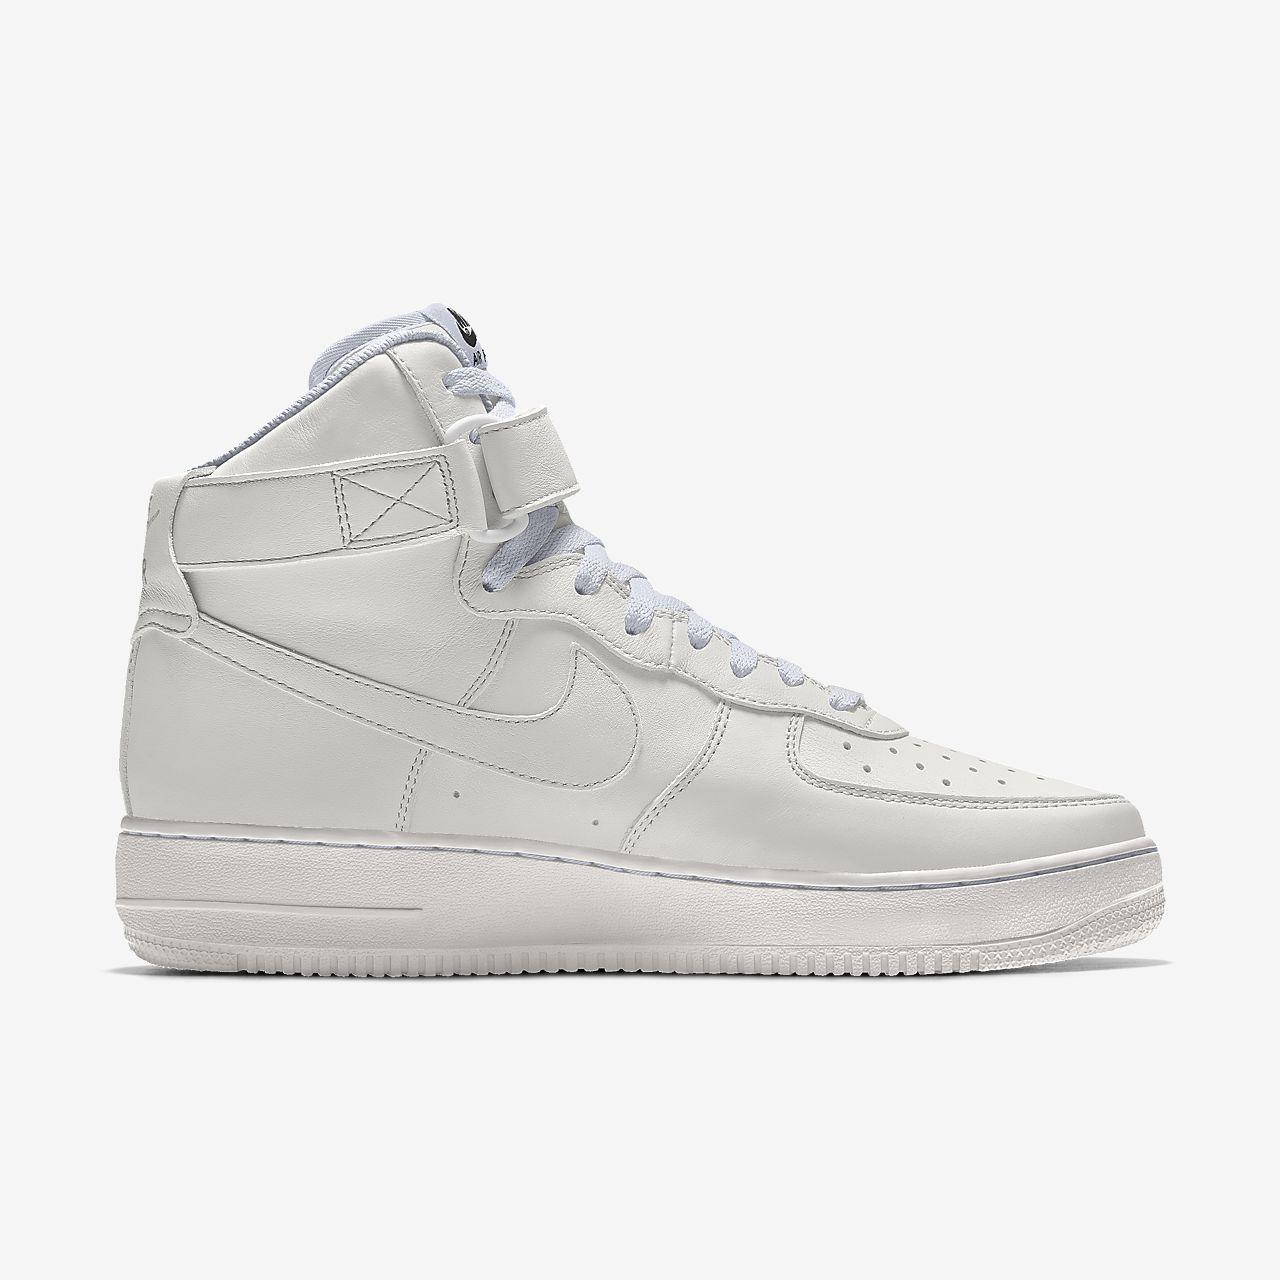 Nike Sportswear Sneaker 'Air Force 1' in weiß | ABOUT YOU